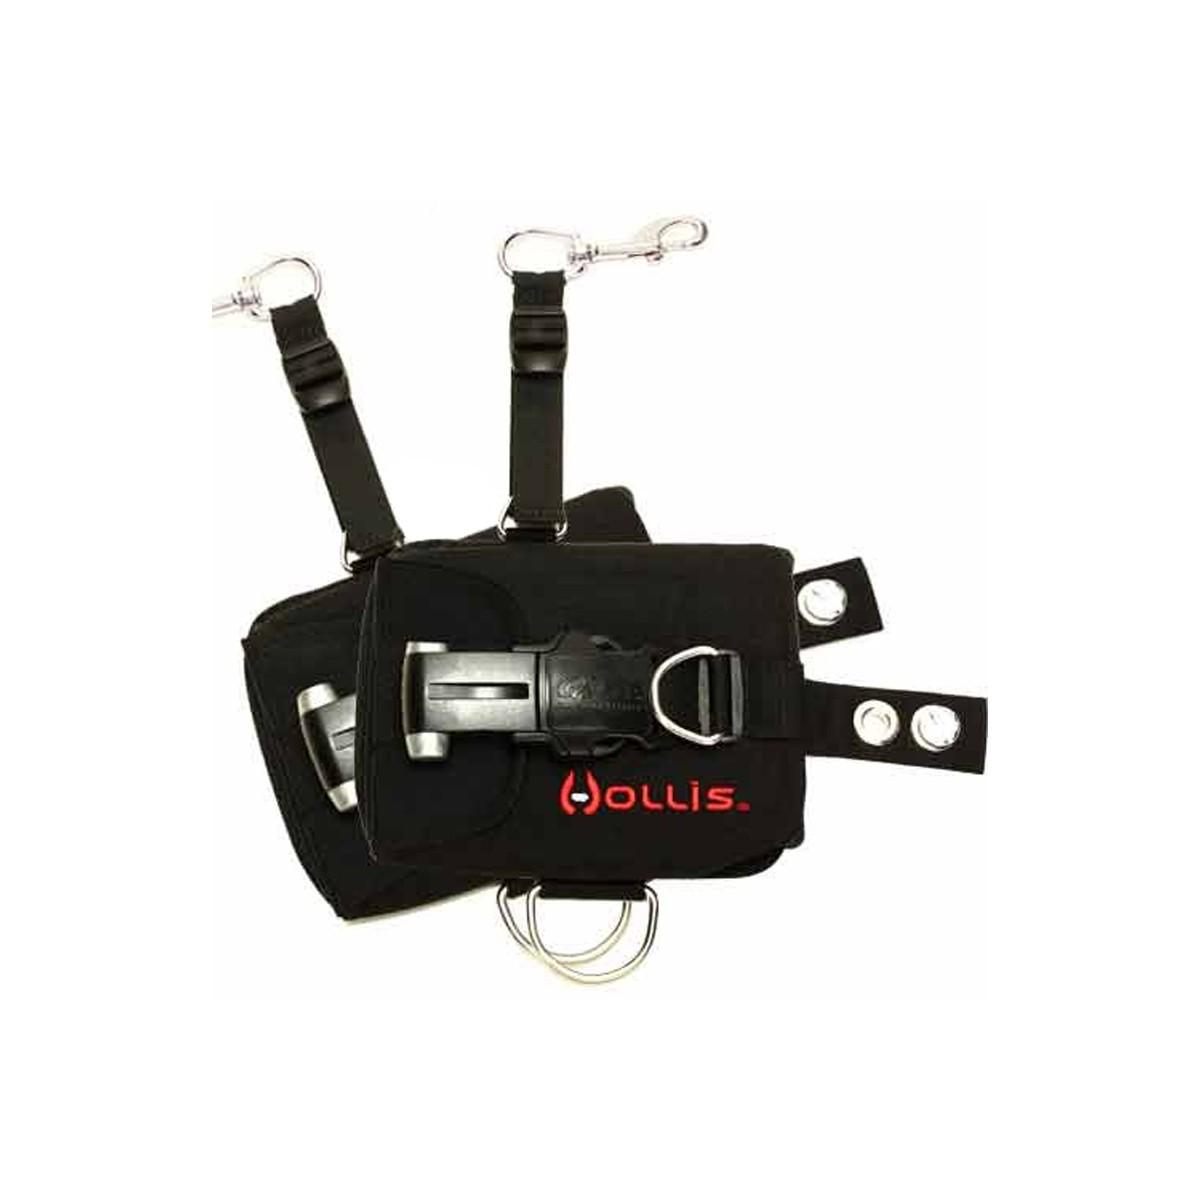 Hollis Hts 10 lb. weight system Qlr 2